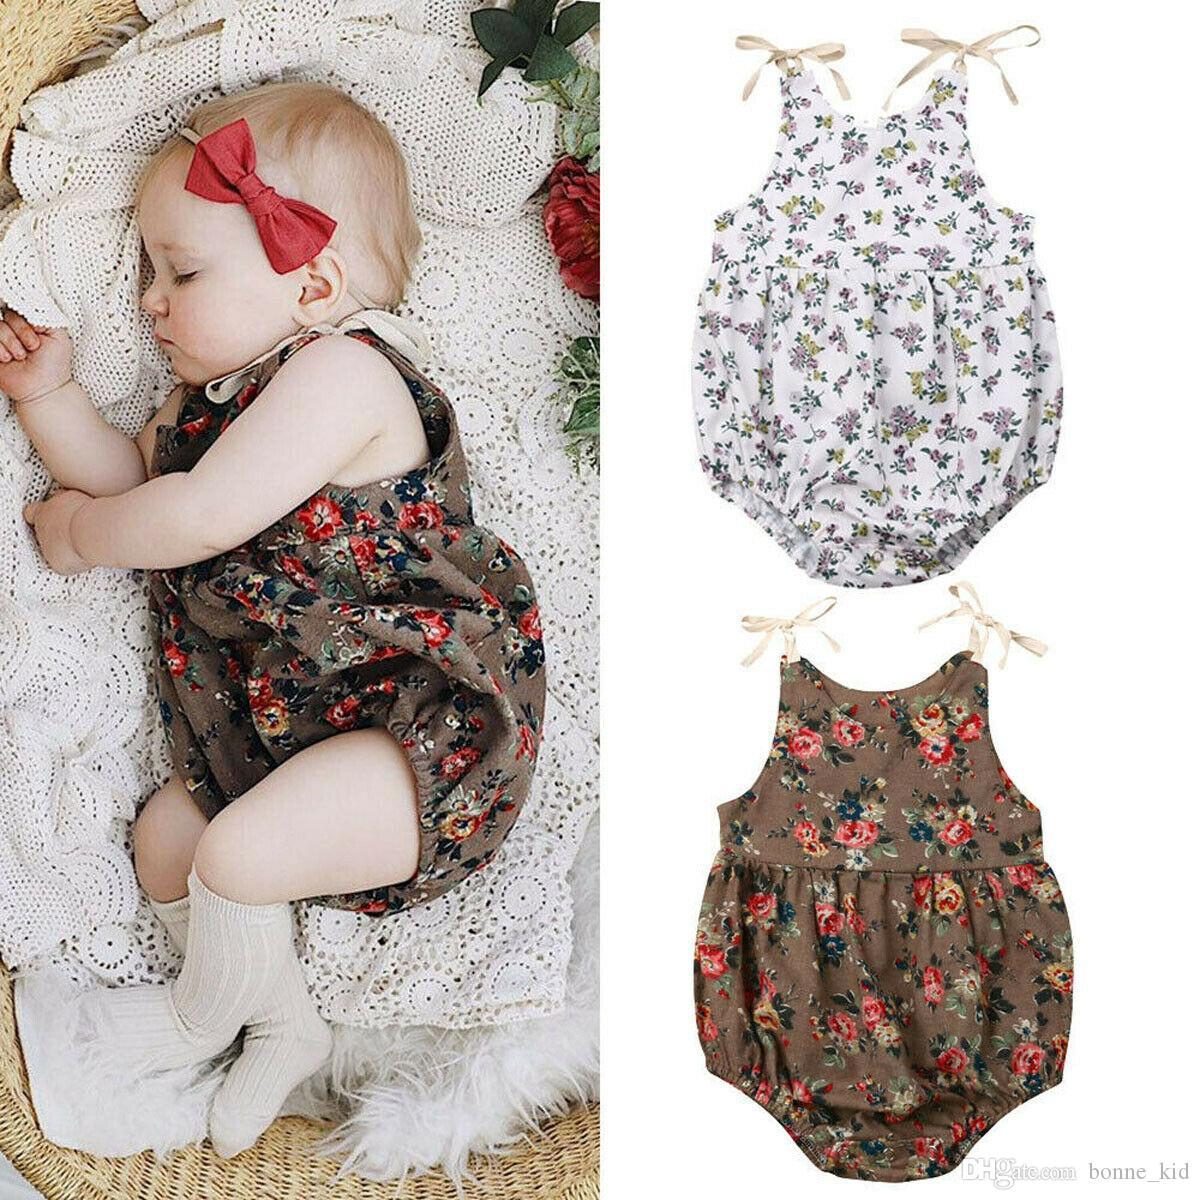 Infant Newborn Baby Girl/'s Floral Cute Romper Bodysuit Jumpsuit Outfits Clothes